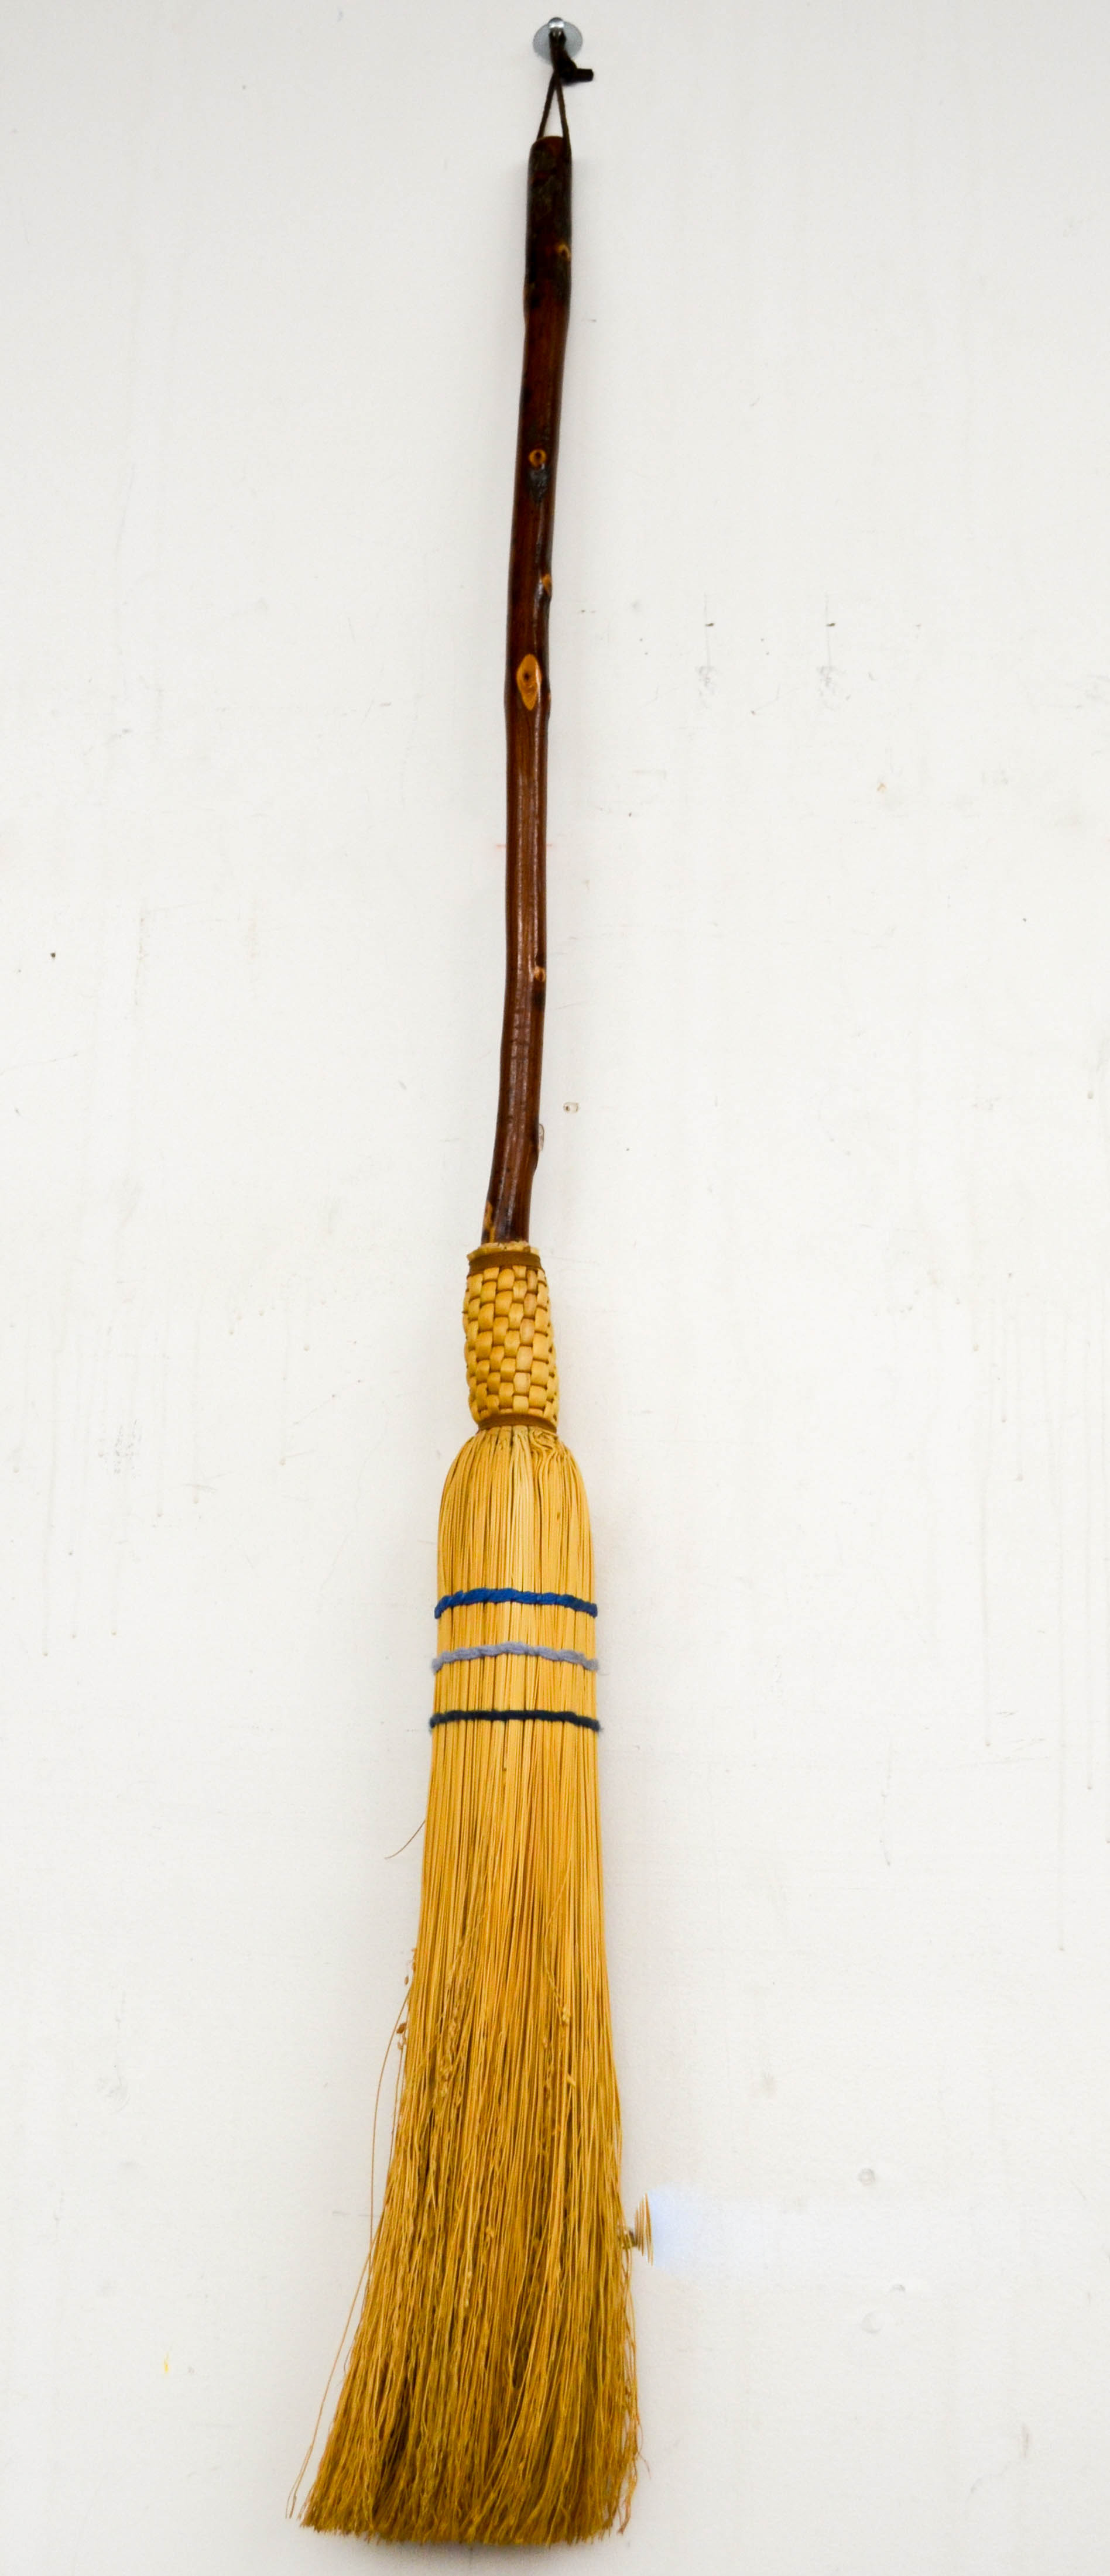 2 Broom